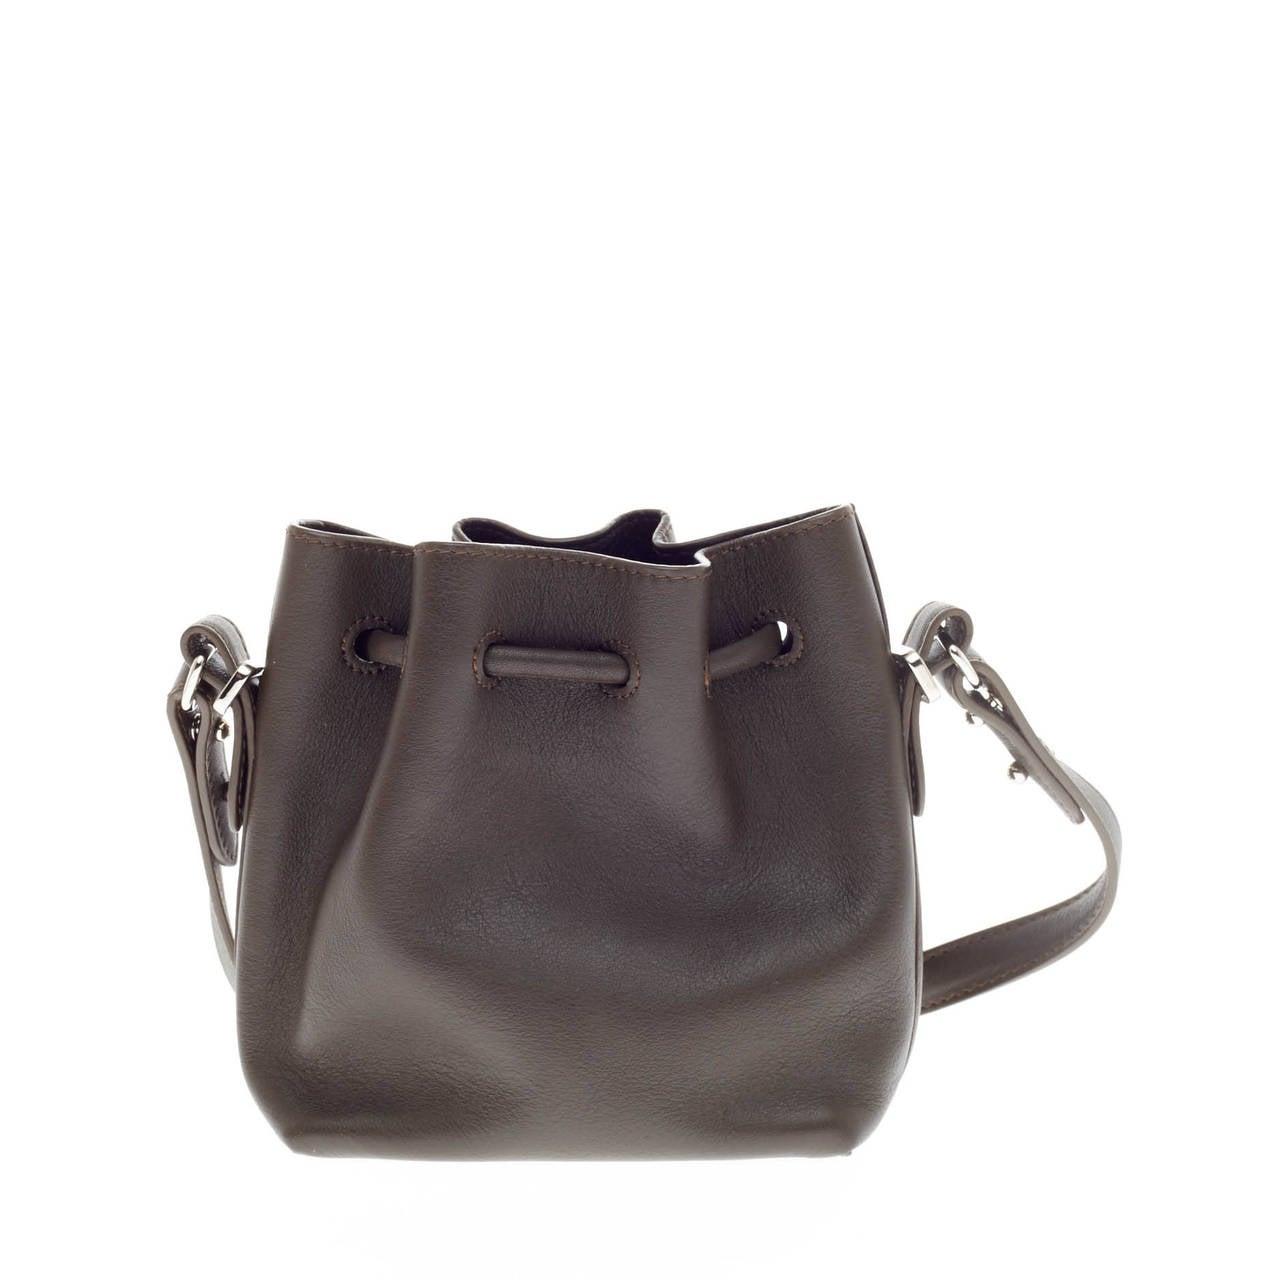 Proenza Schouler Bucket Bag Leather Tiny 4